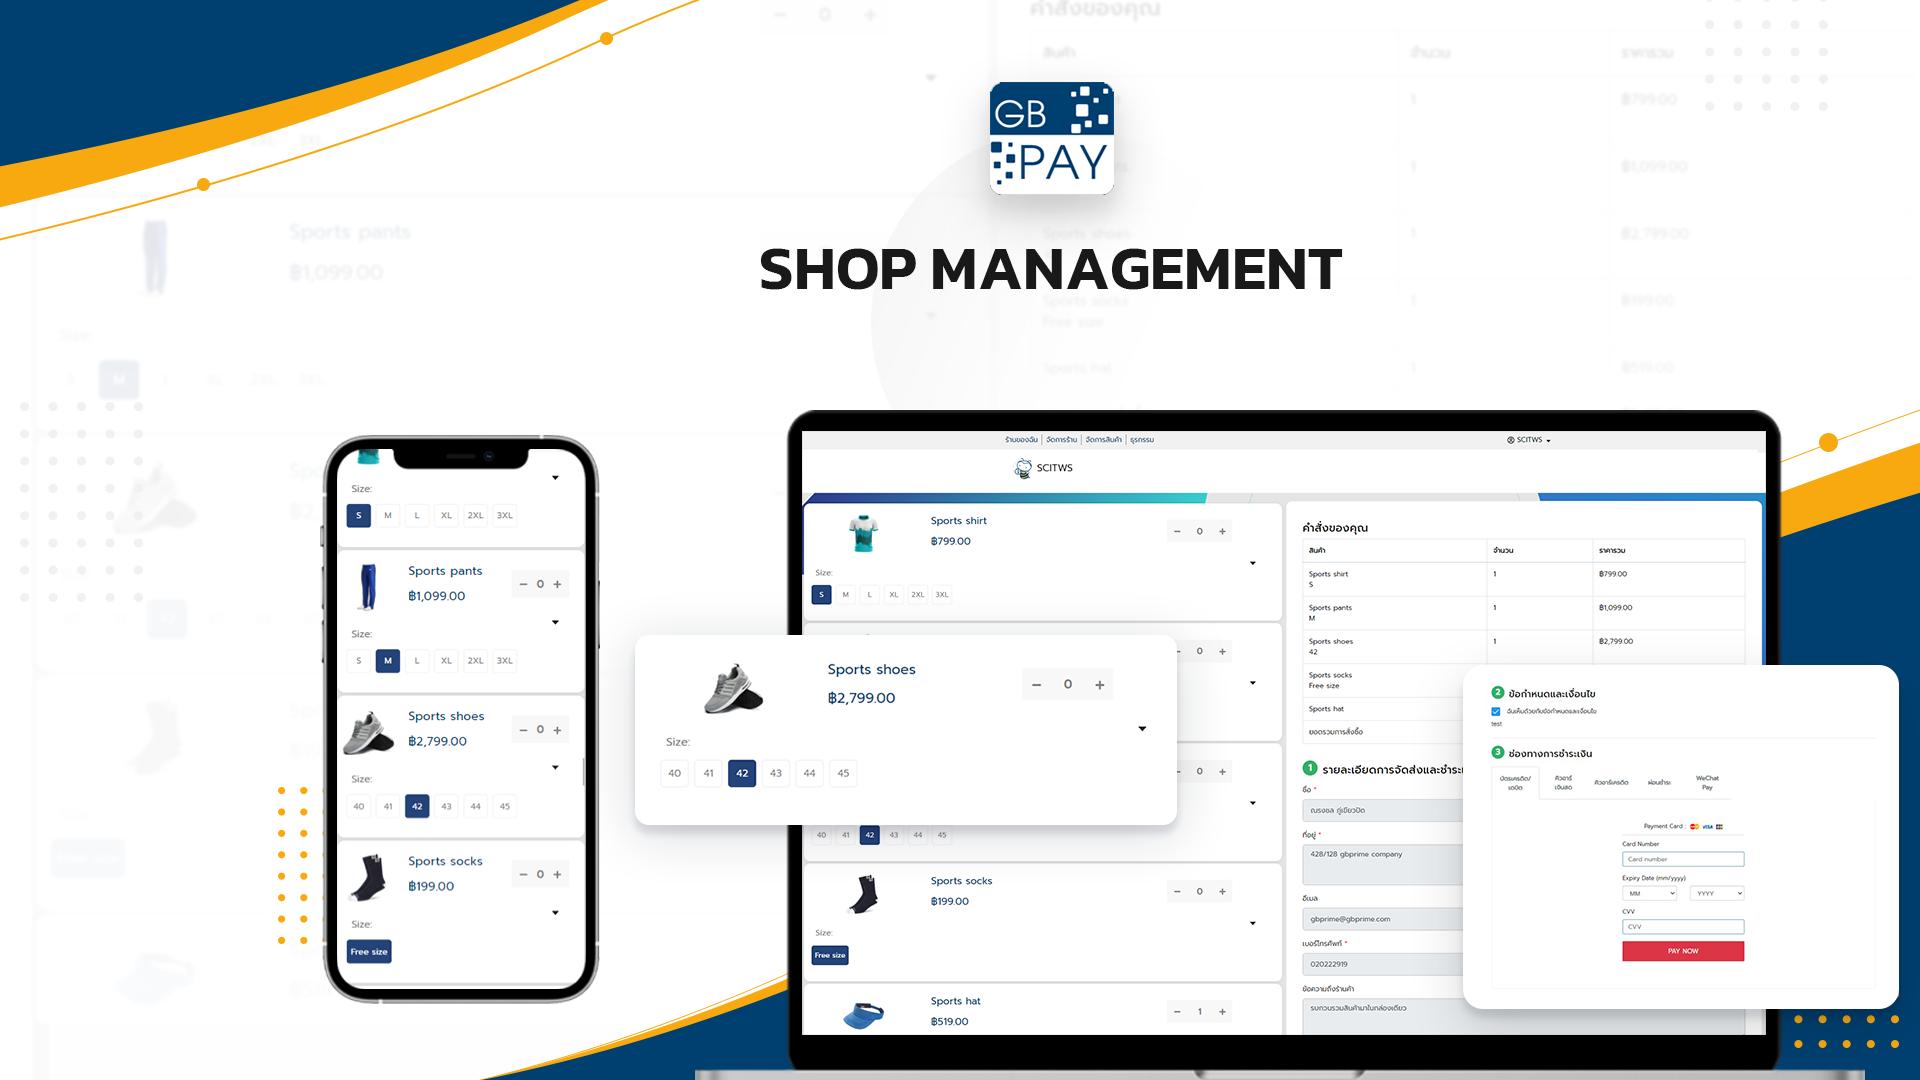 GB PRIME PAY เปิดบริการใหม่ GB SHOP ให้บริการแก่ร้านค้าออนไลน์ฟรี